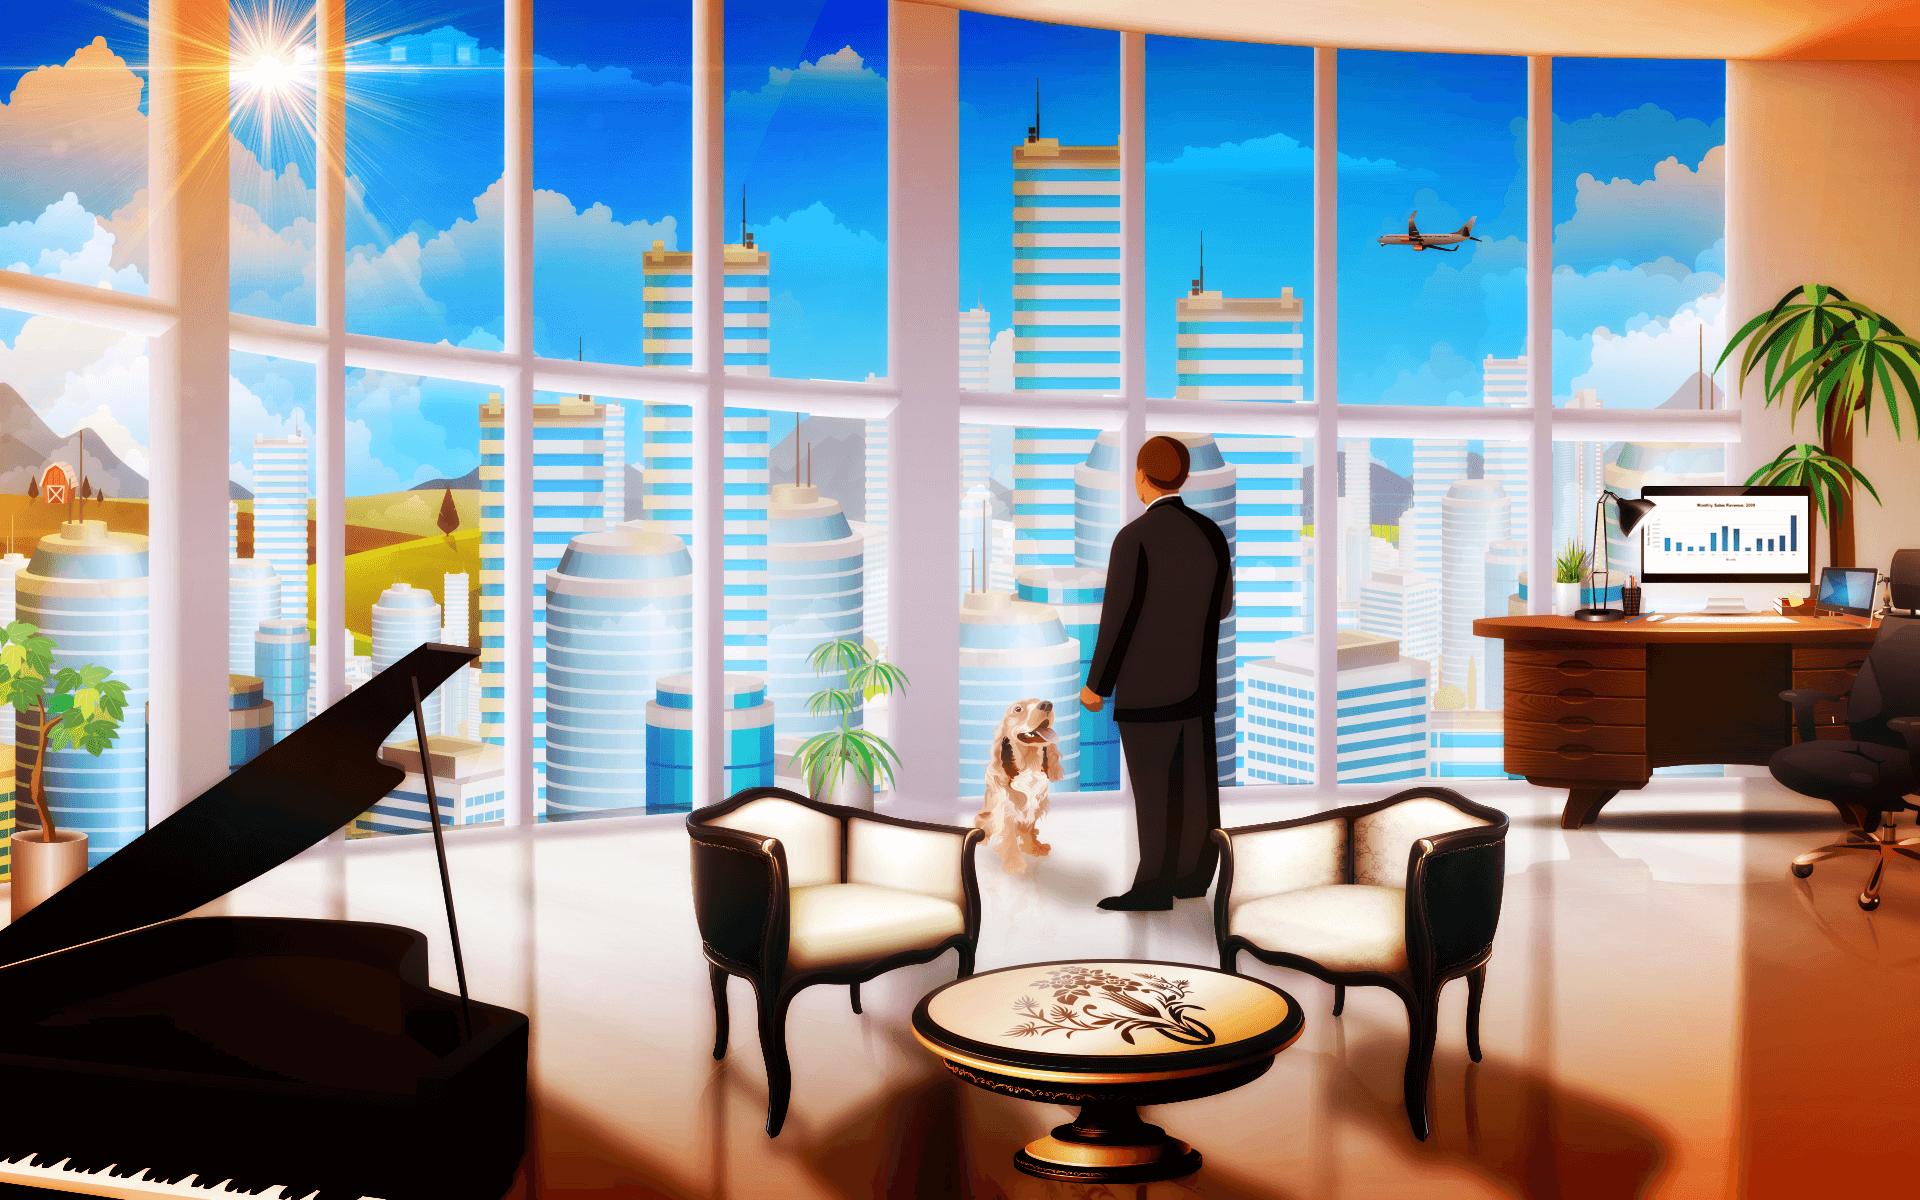 Business simulation game - Sim Companies